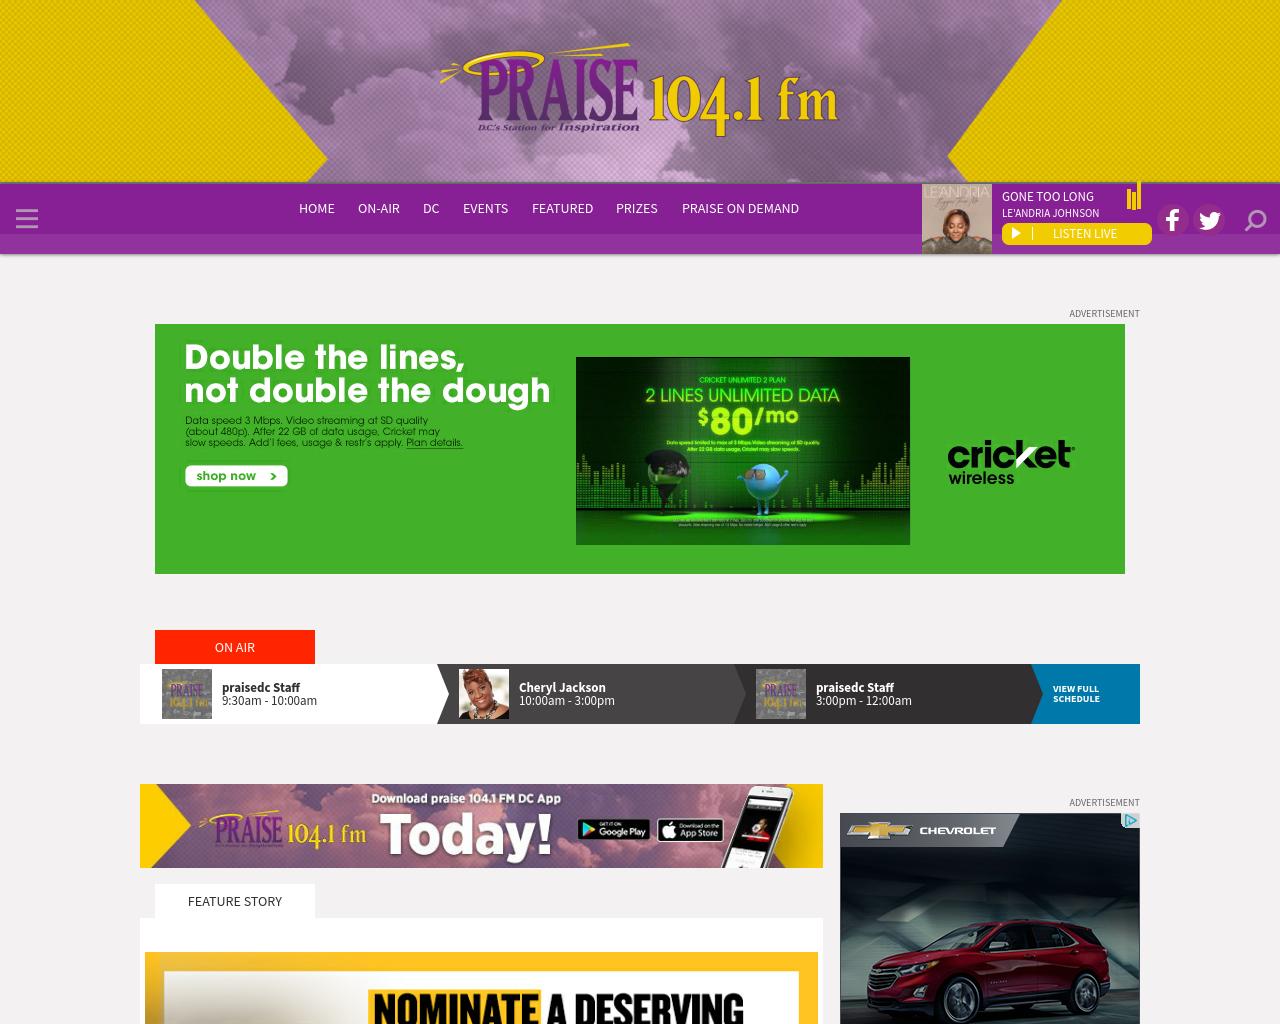 Praised104.1fm-Advertising-Reviews-Pricing